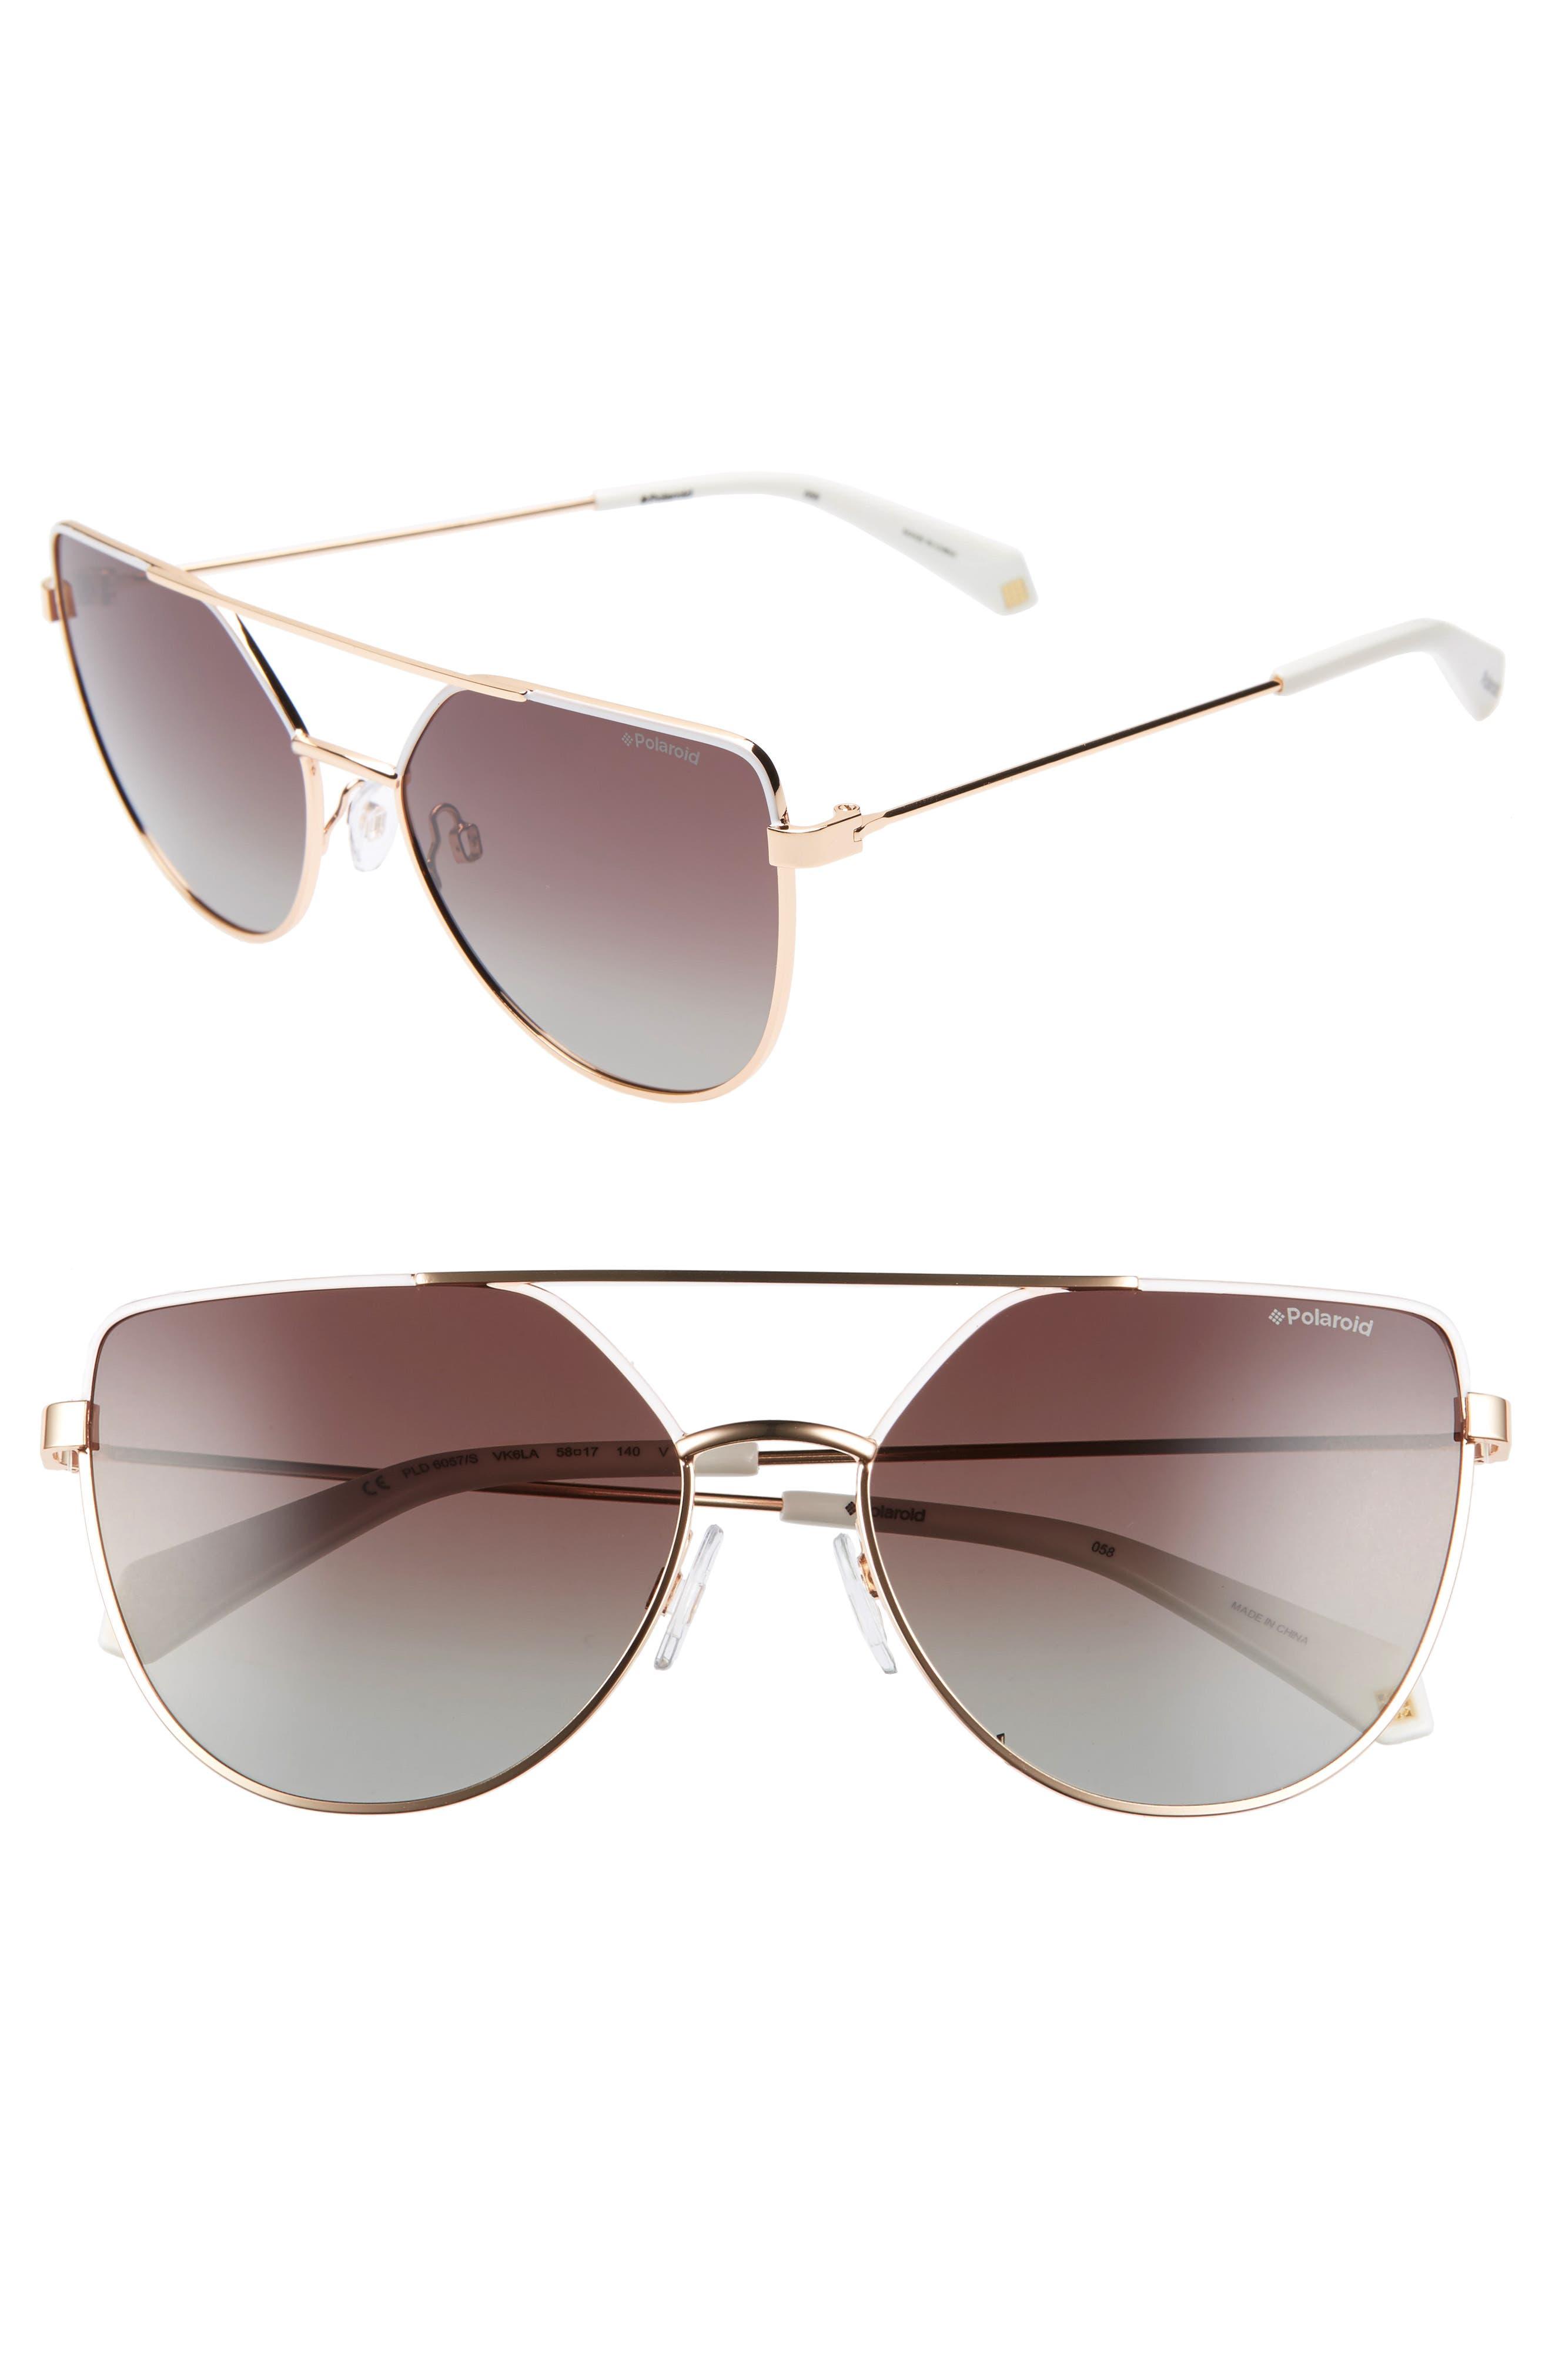 Polaroid 5m Polarized Sunglasses - White/ Gold